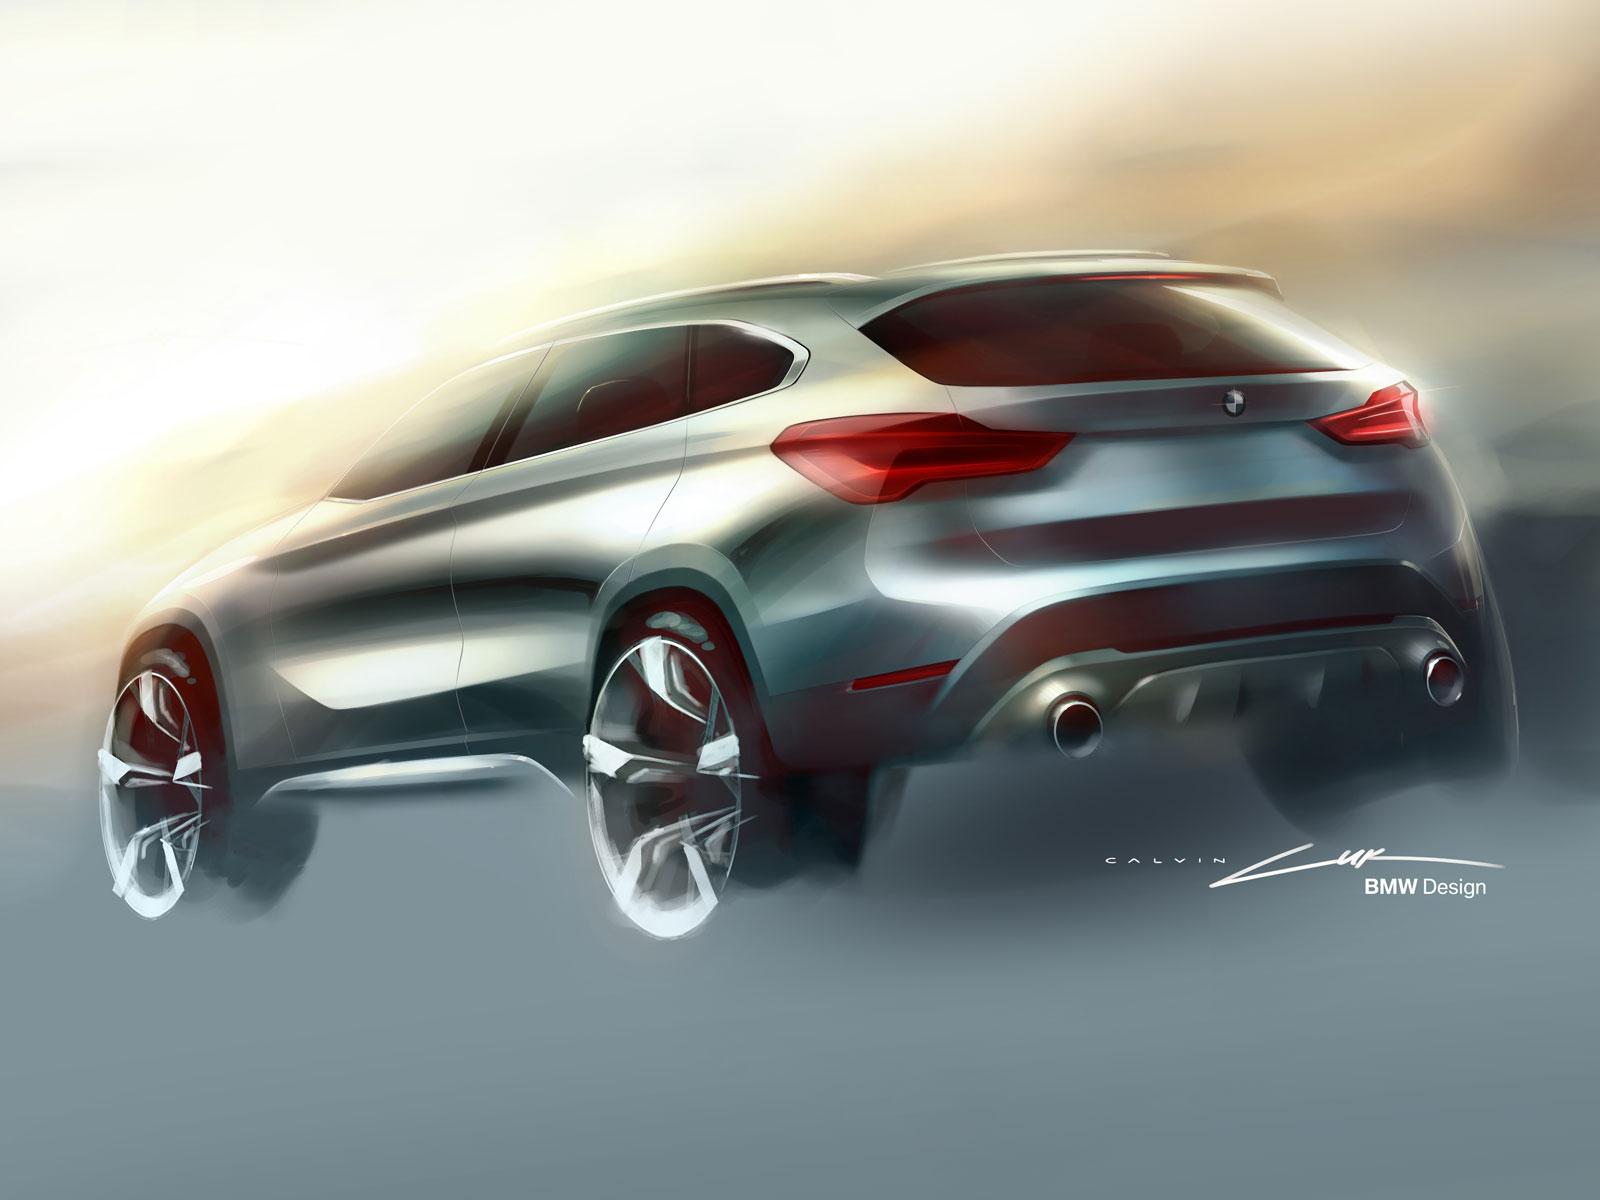 2016 BMW X1 - Design Sketch - Car Body Design